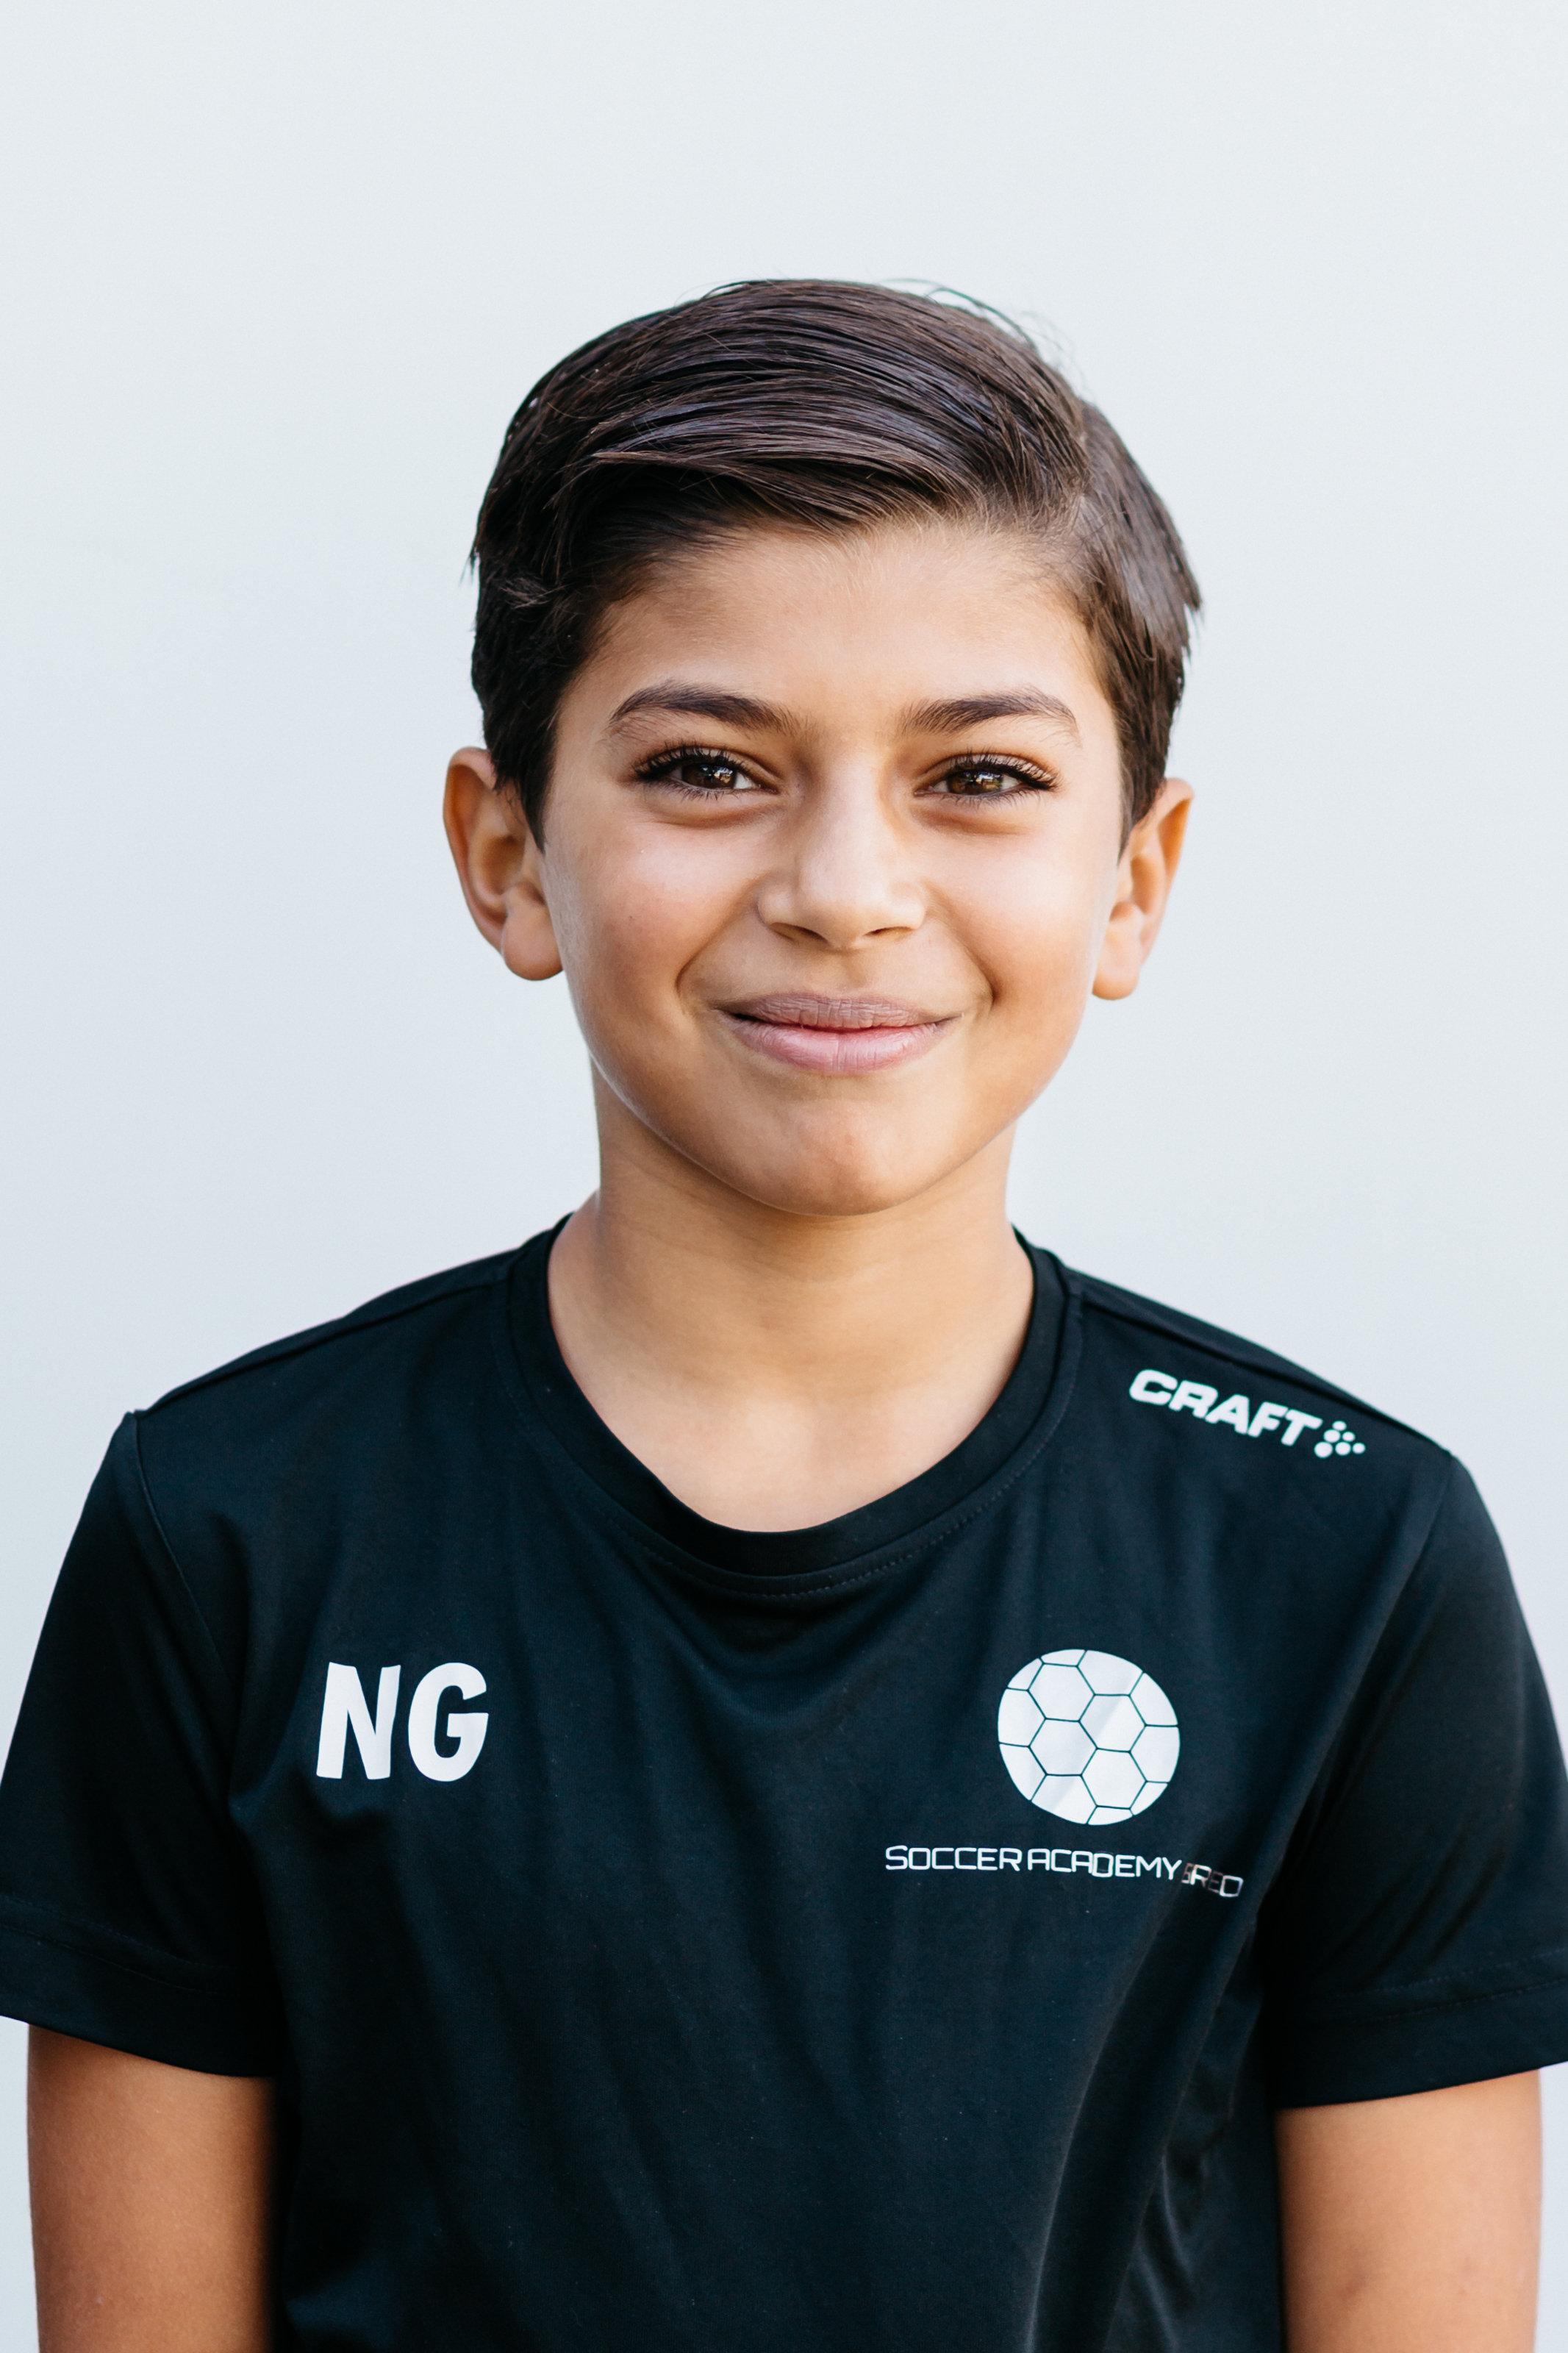 https://socceracademybreda.nl/wp-content/uploads/2020/10/nordin-gaoui-teampagina.jpg